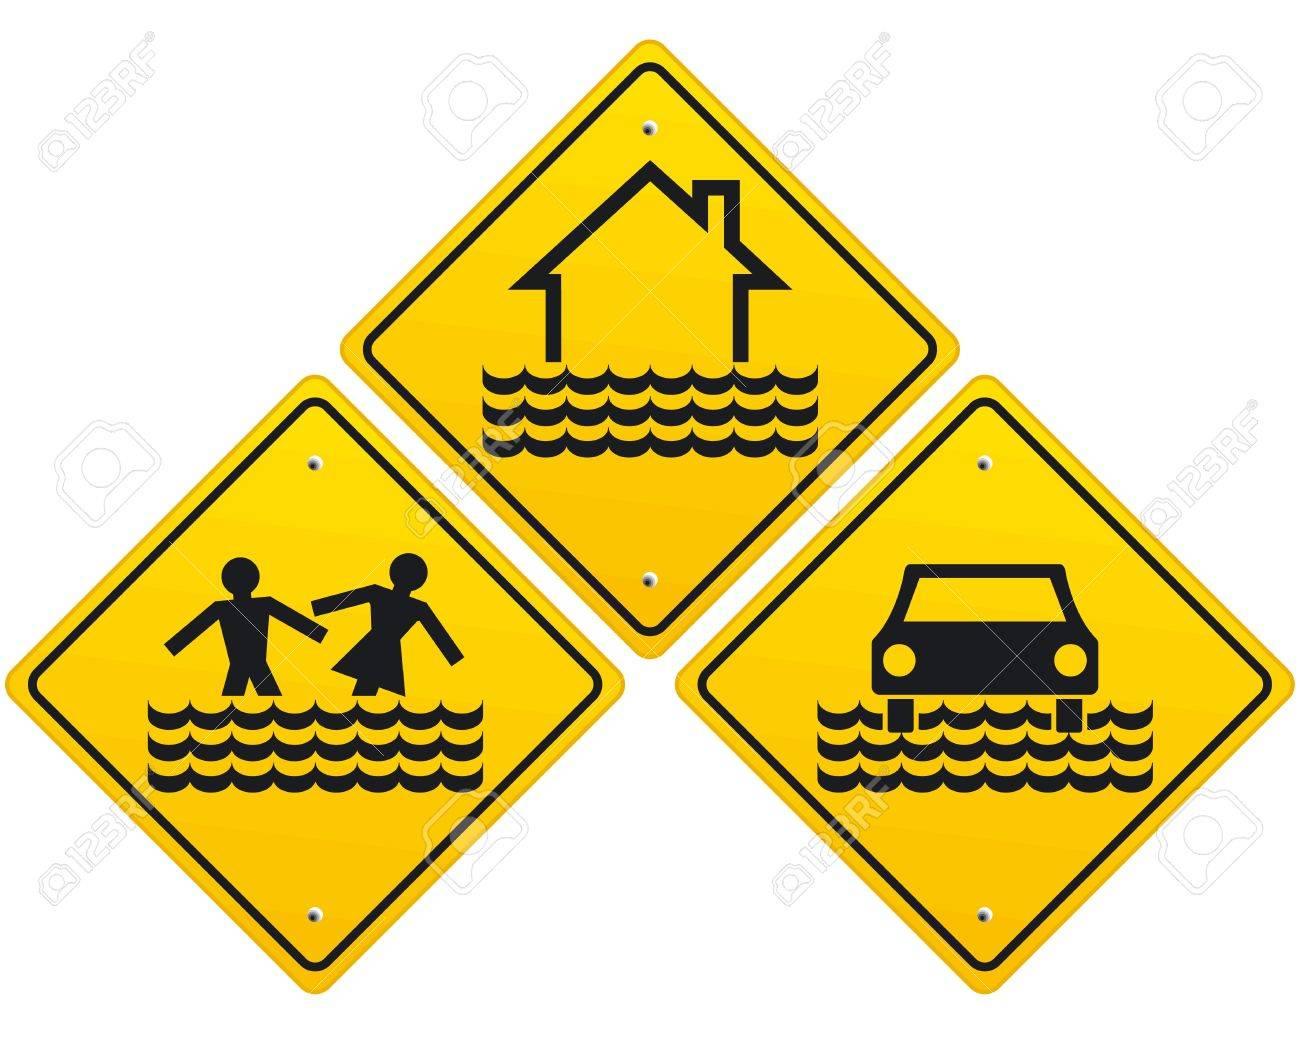 Flood warning sign Stock Vector - 11464551